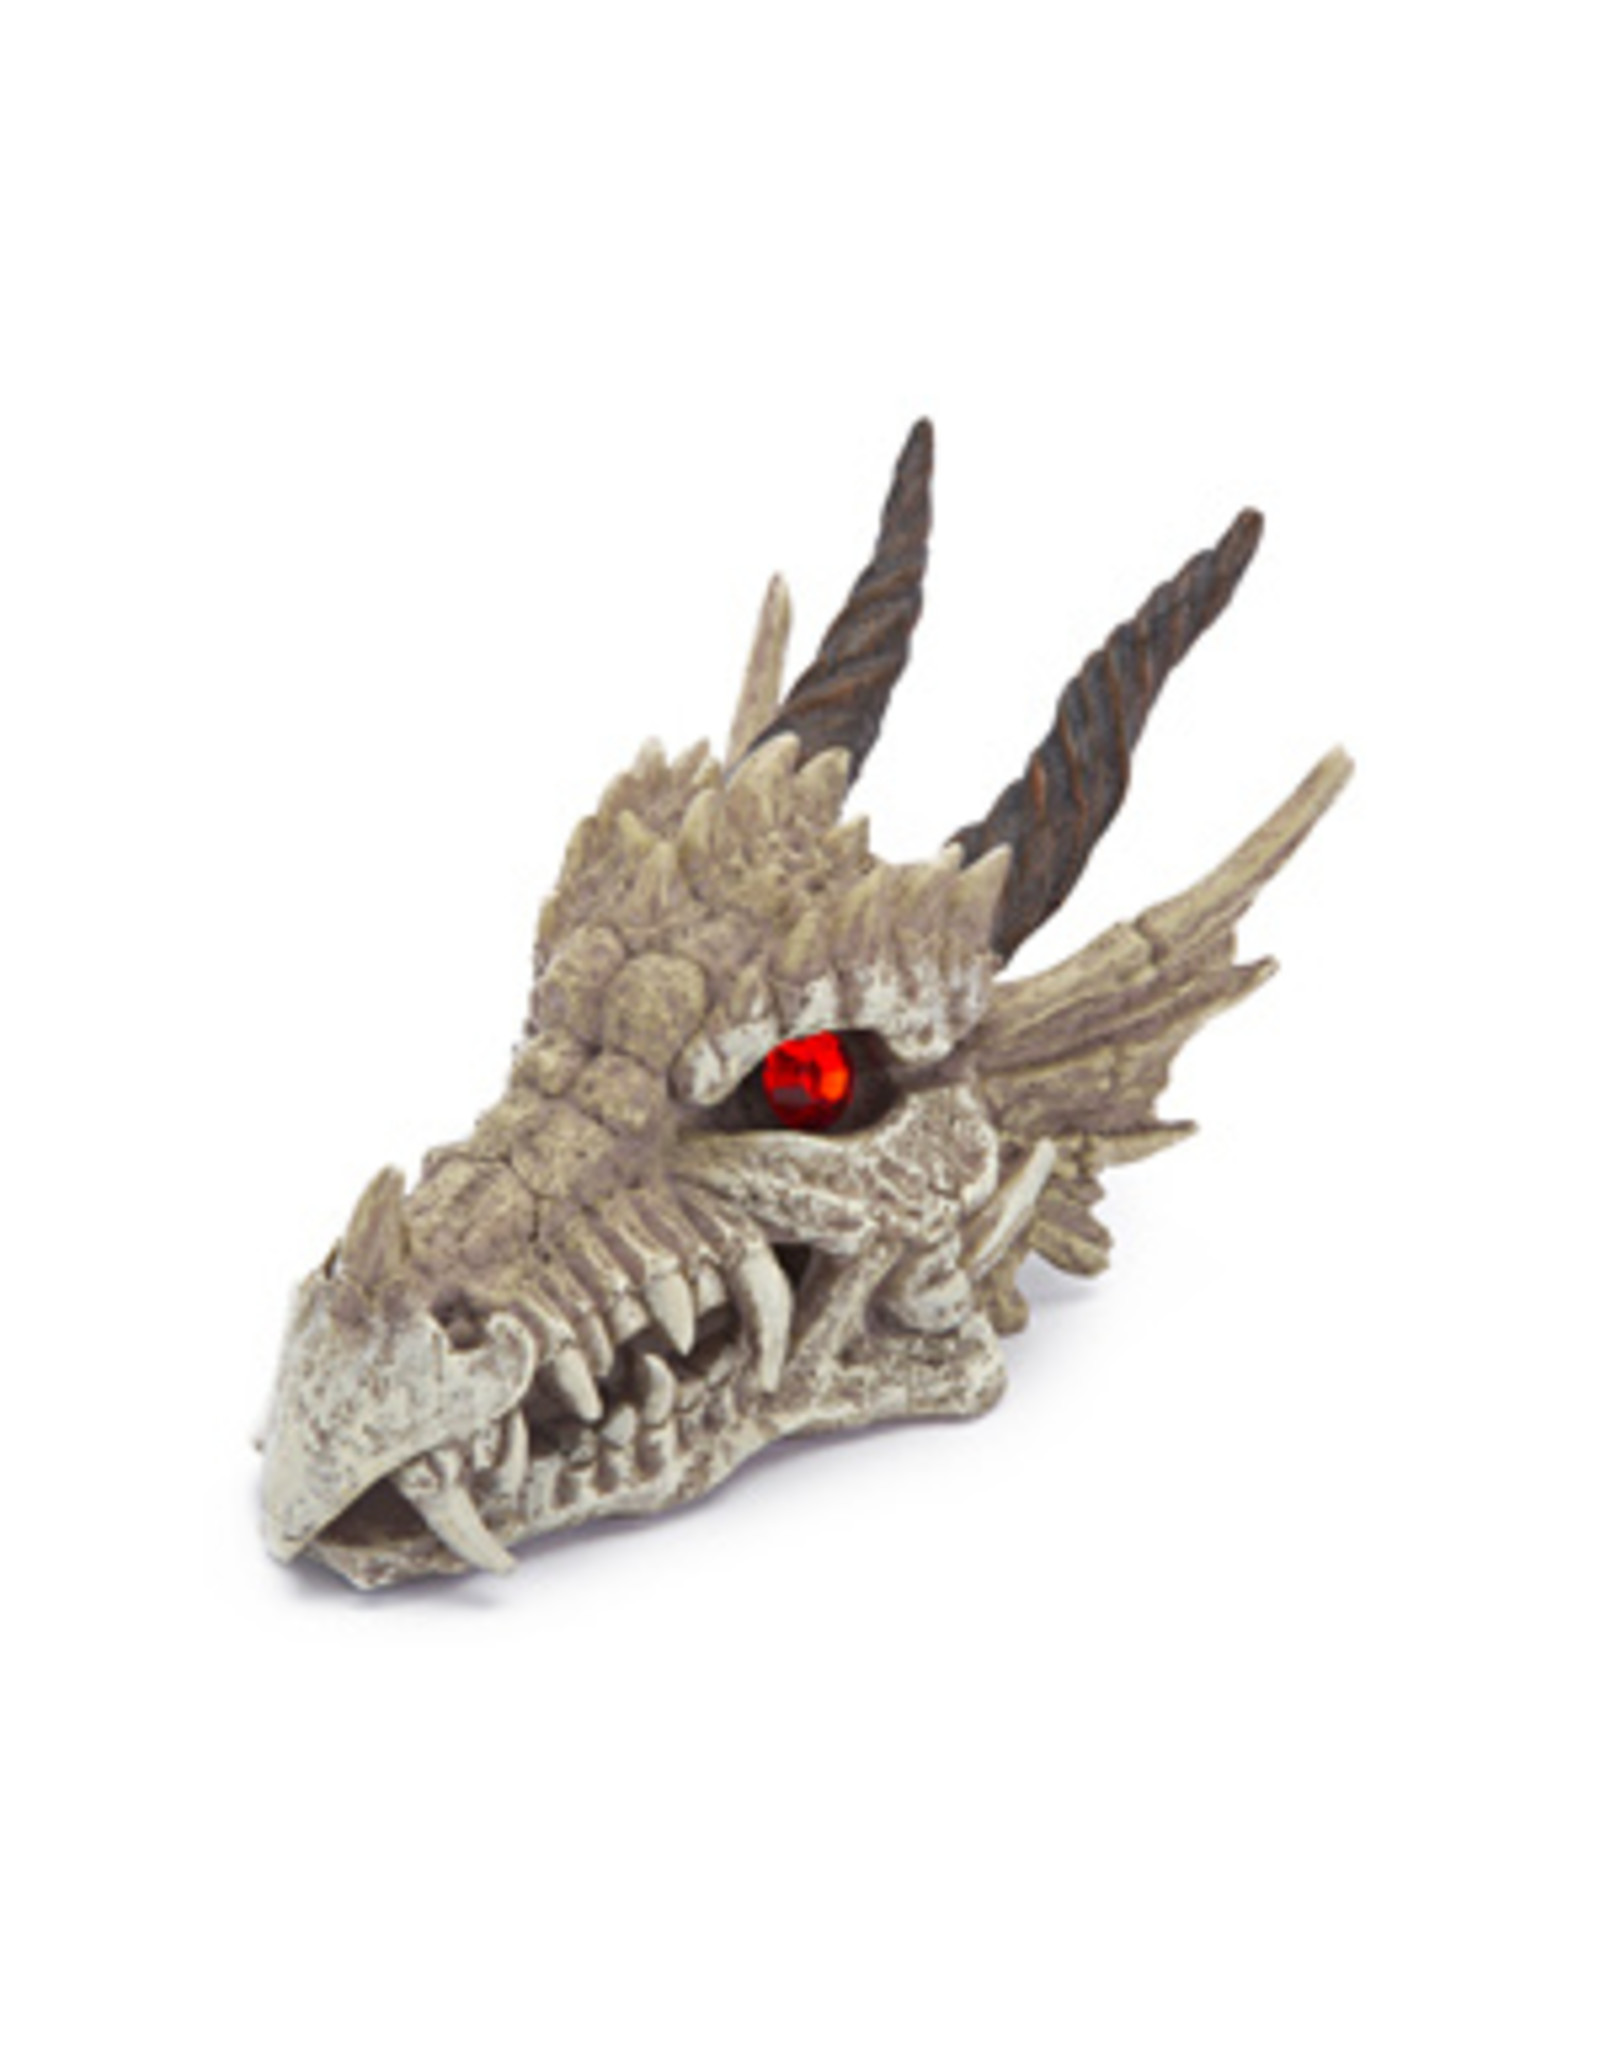 Penn Plax PENN PLAX Dragon Skull Gazer Large 7.5 inch